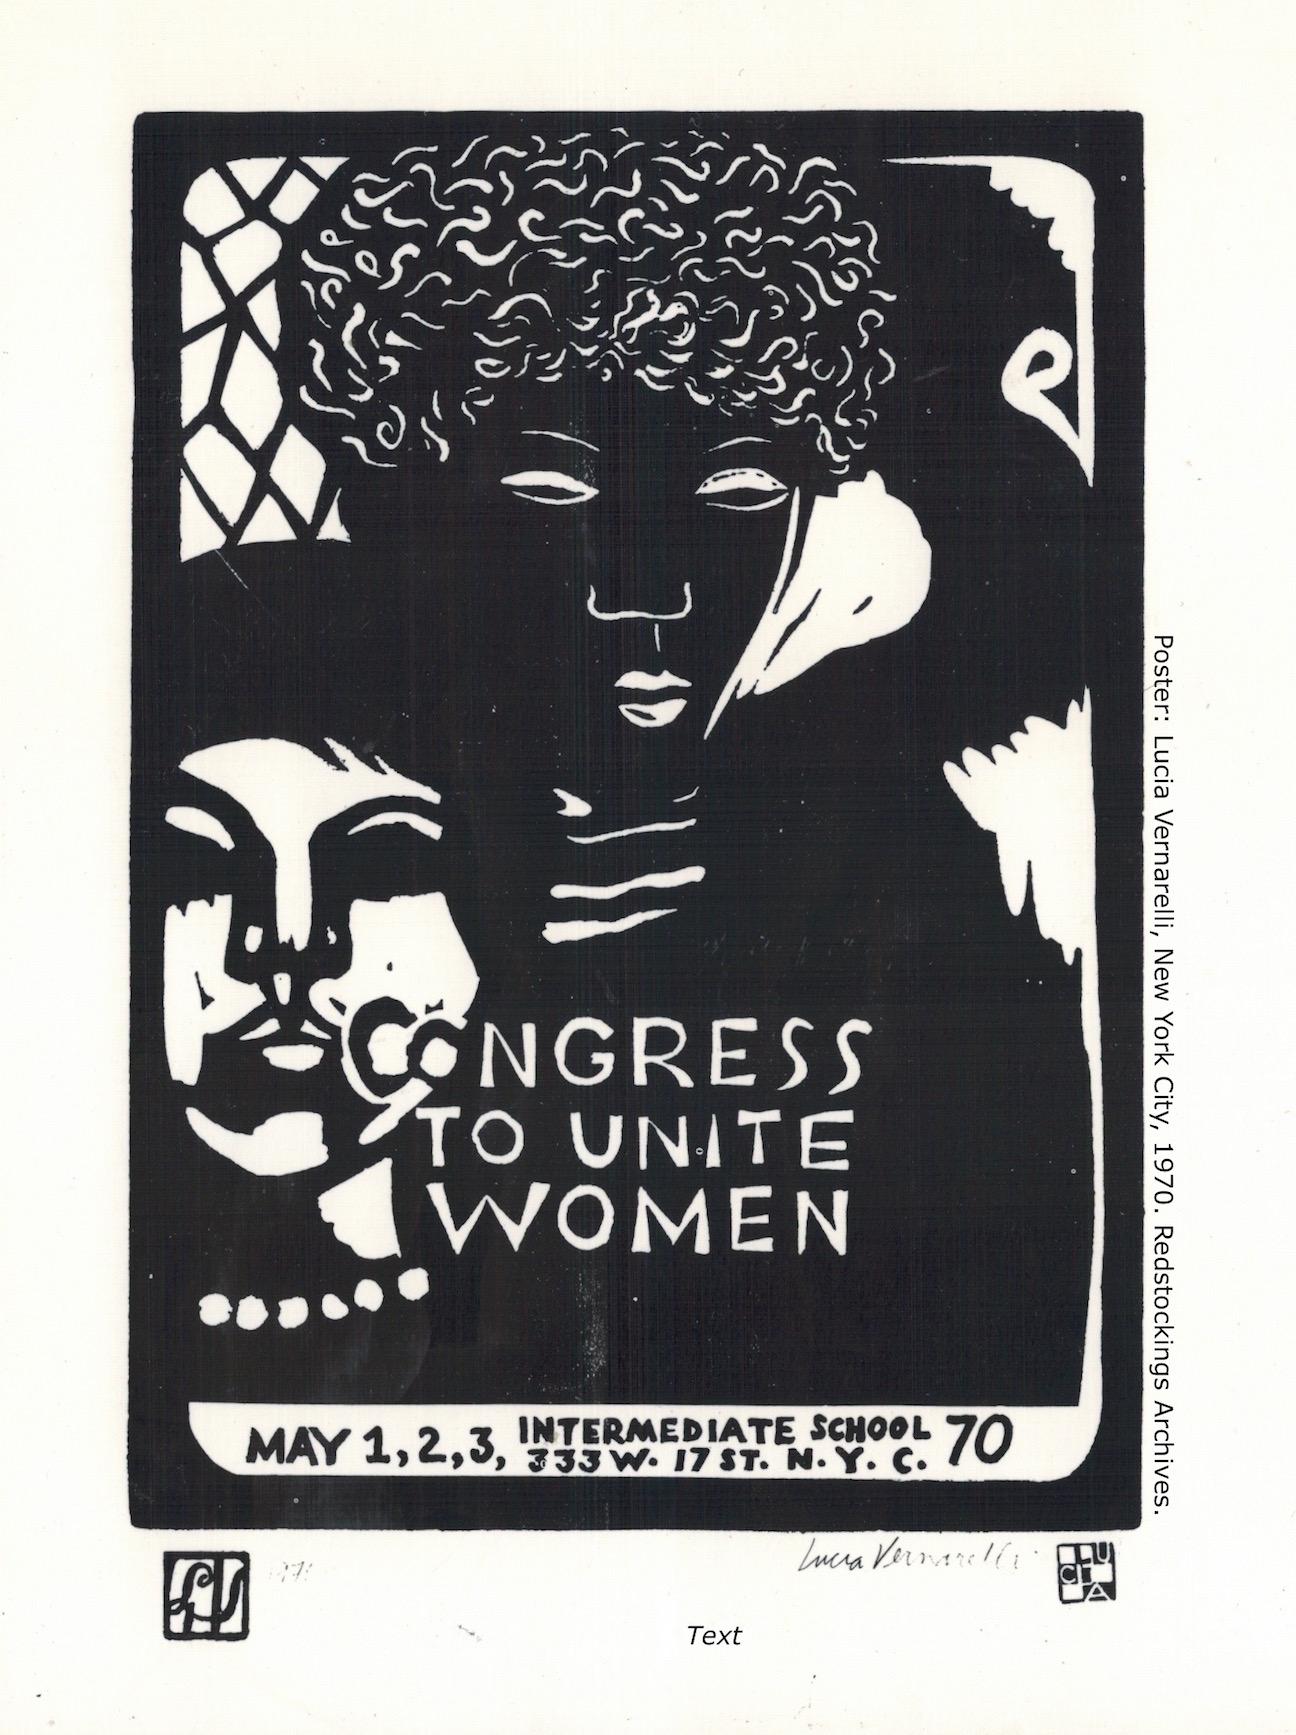 5. Lucia Vernarelli, New York City, 1970. Redstockings Archives